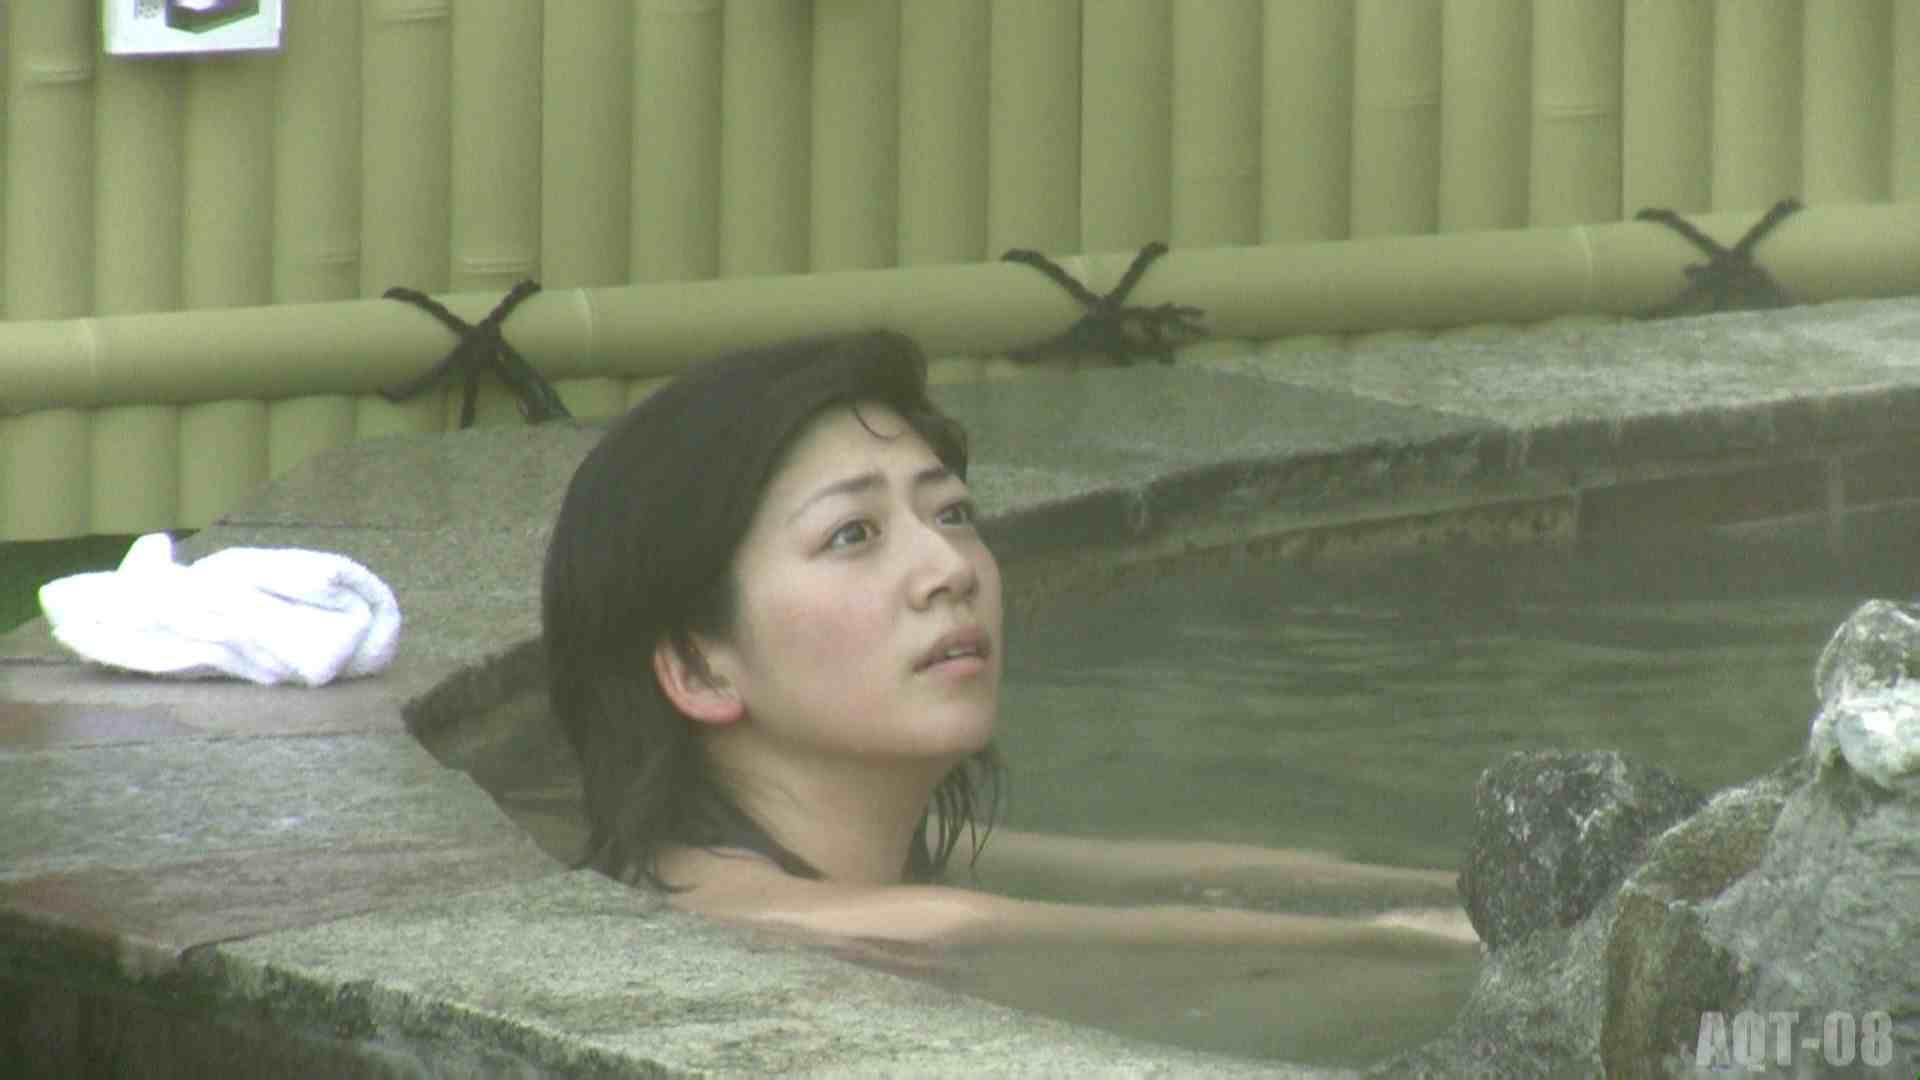 Aquaな露天風呂Vol.776 盗撮 | HなOL  60pic 59